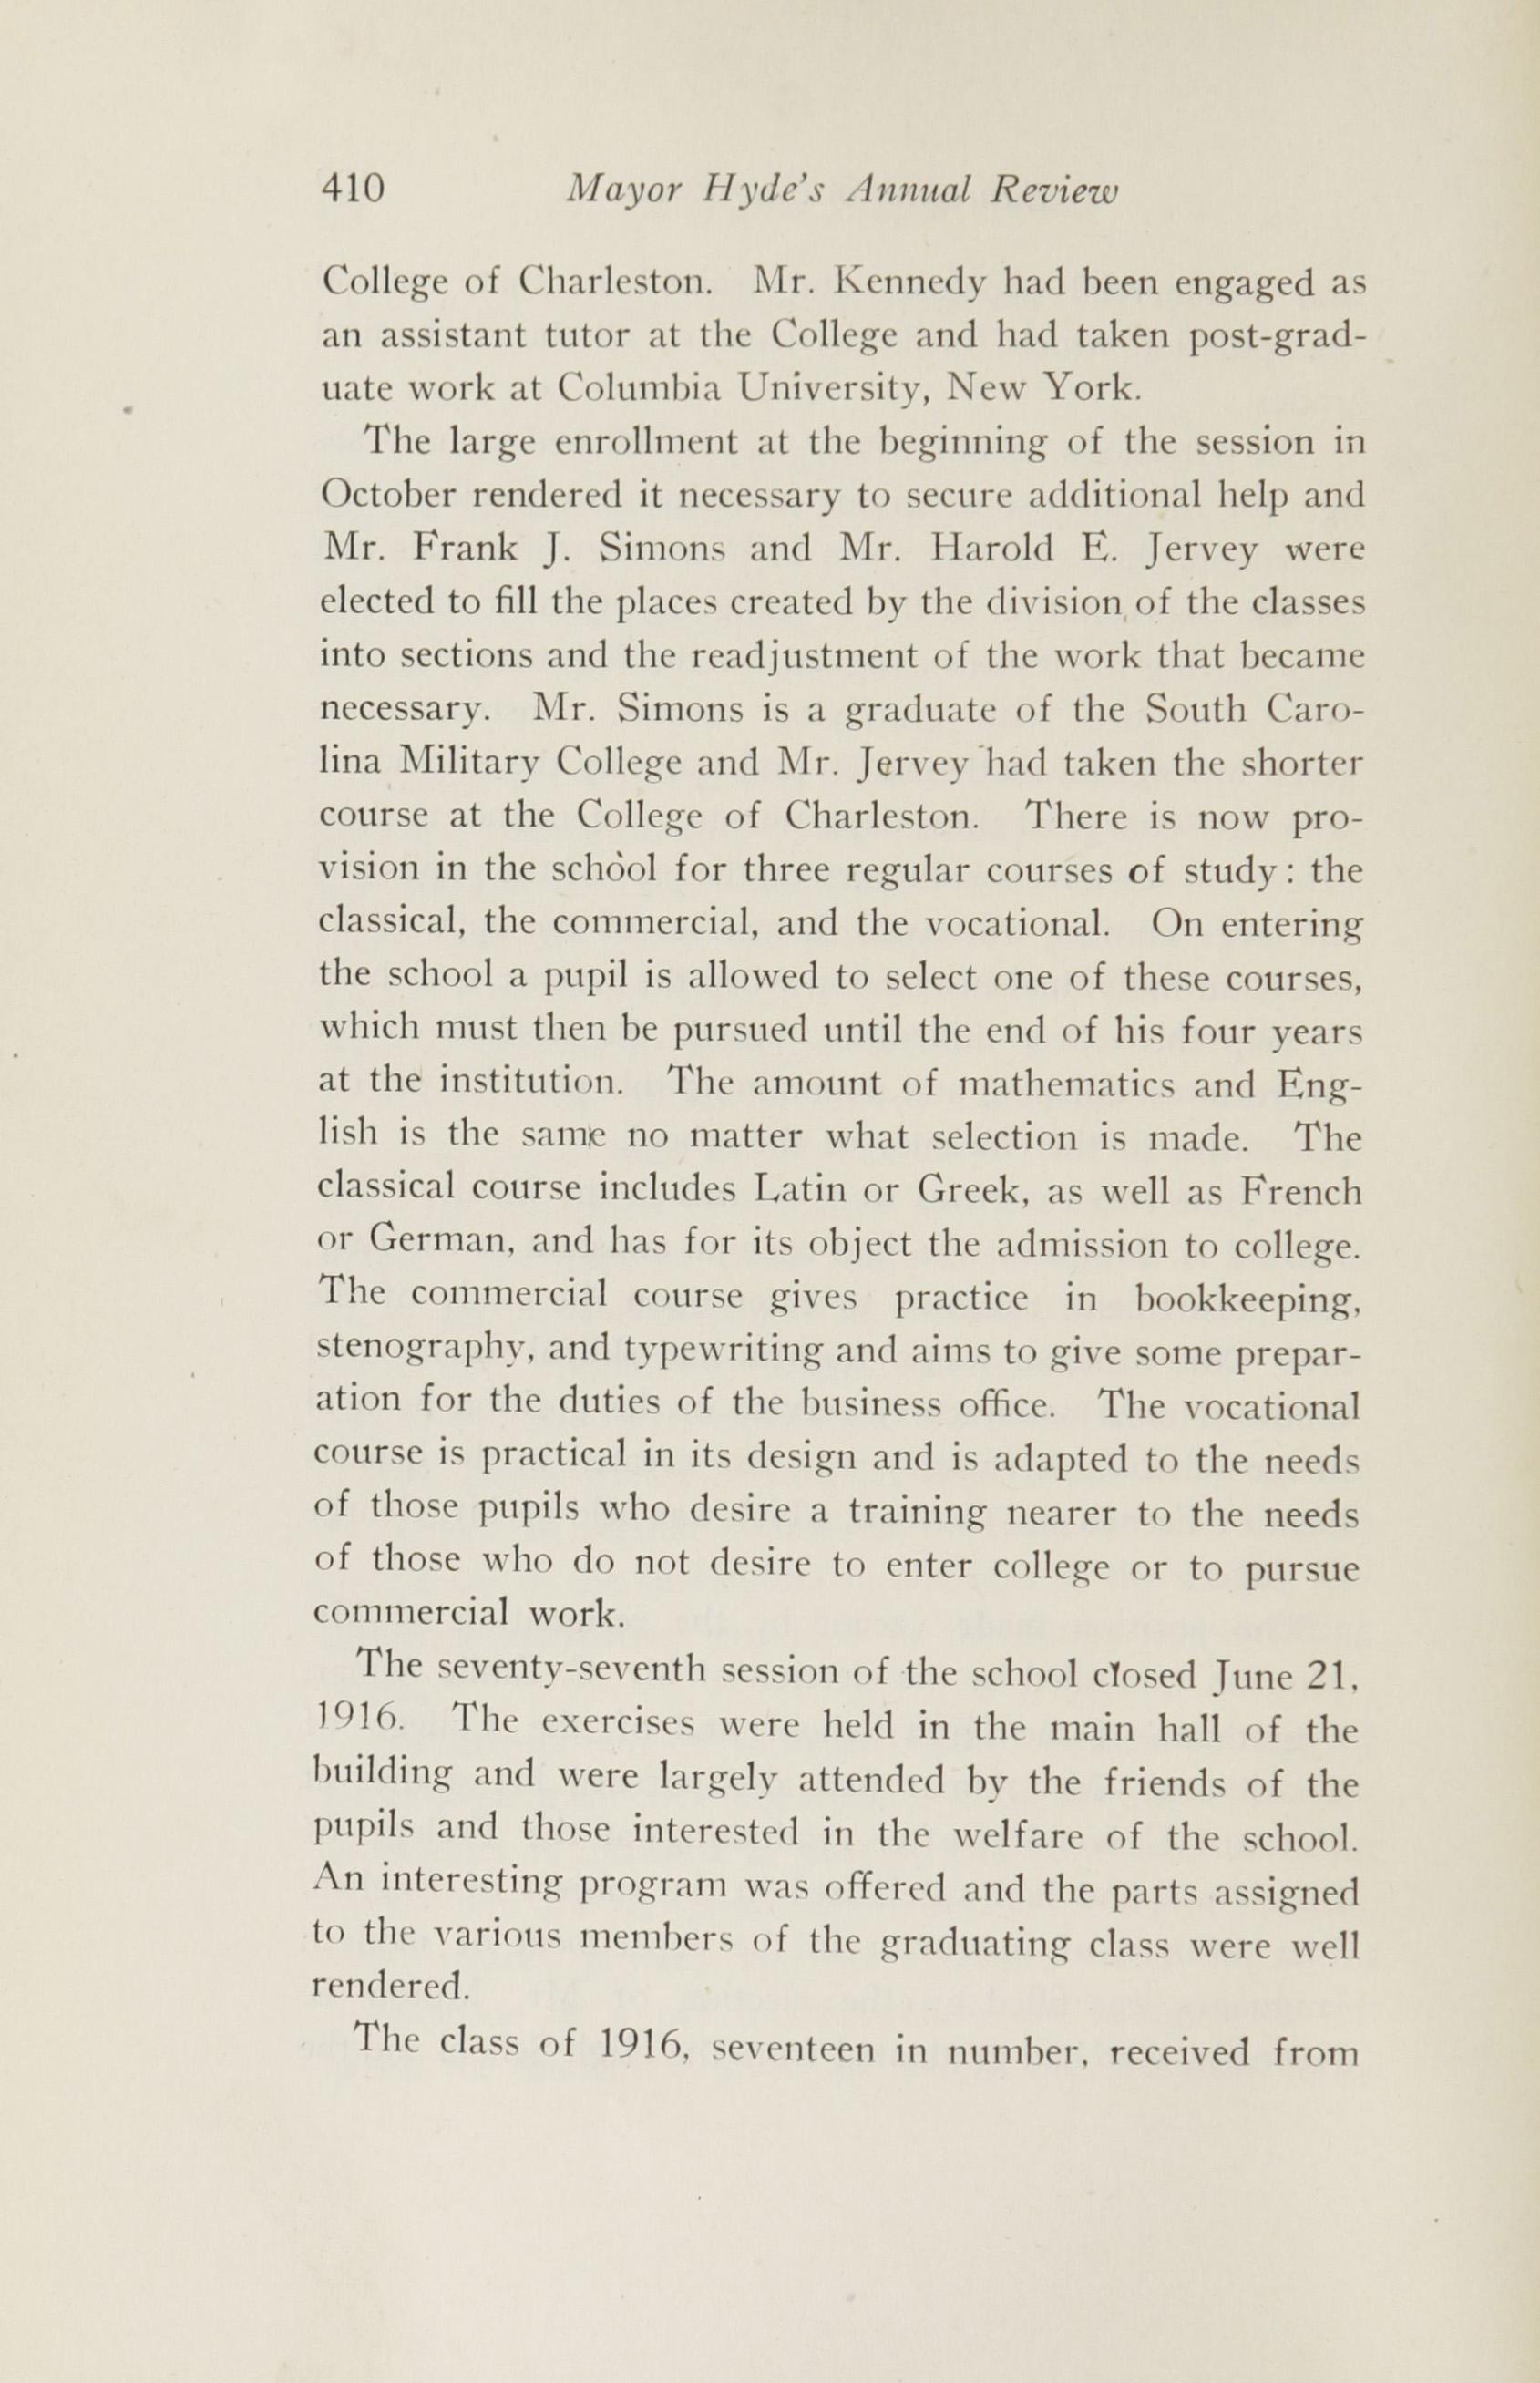 Charleston Yearbook, 1916, page 410